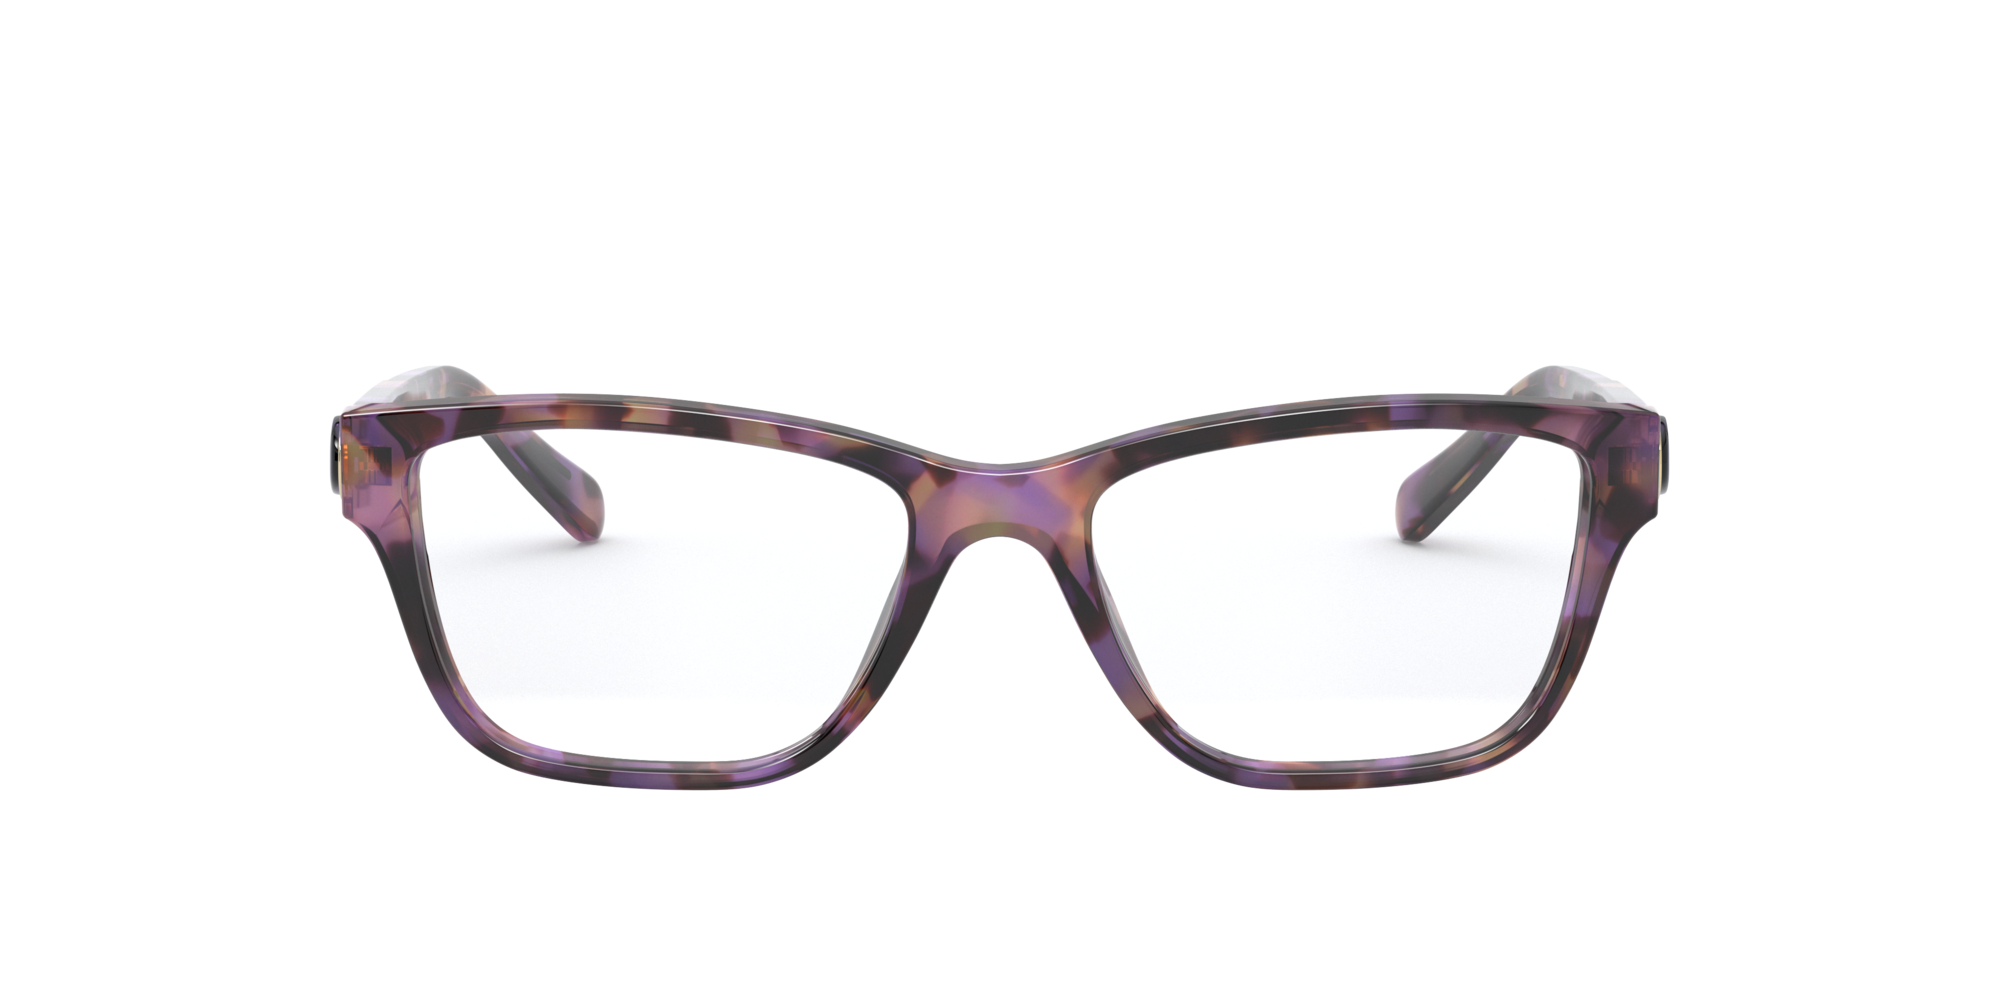 Image for HC6154 from LensCrafters | Glasses, Prescription Glasses Online, Eyewear